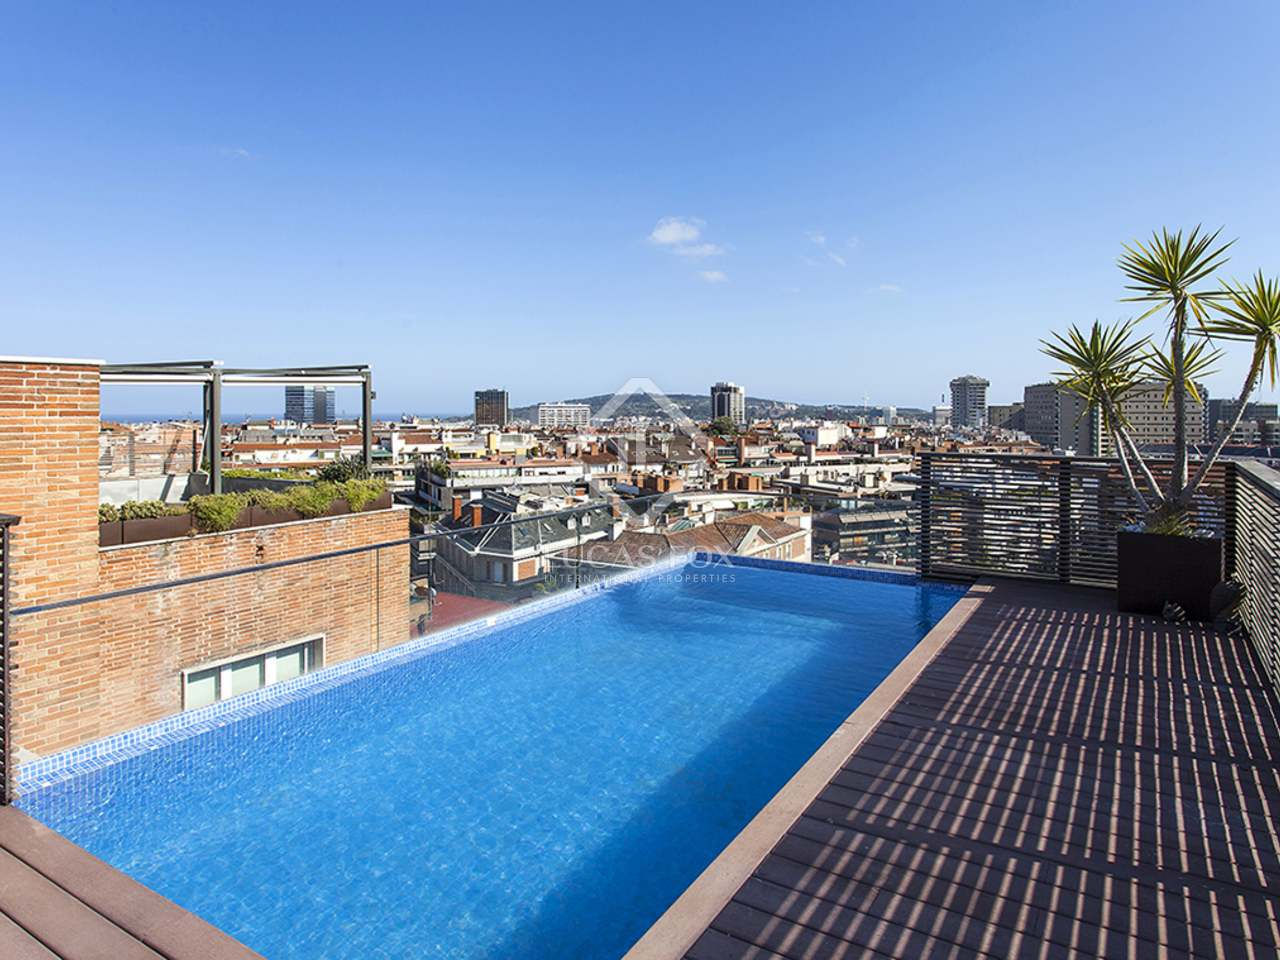 Tico con piscina privada en venta cerca de tur park for Aticos con piscina